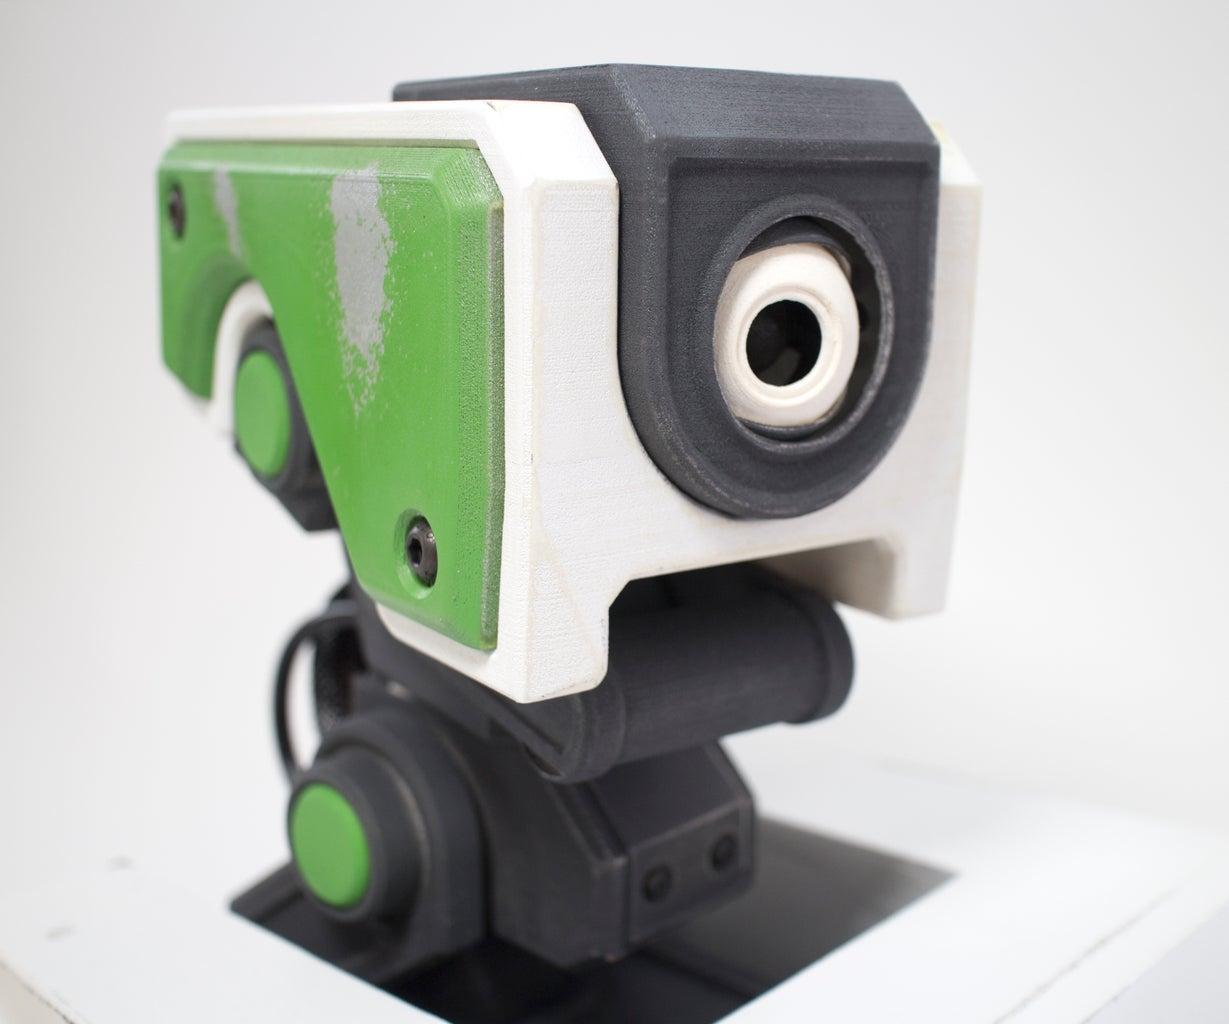 3D Printed Animatronic Puppet